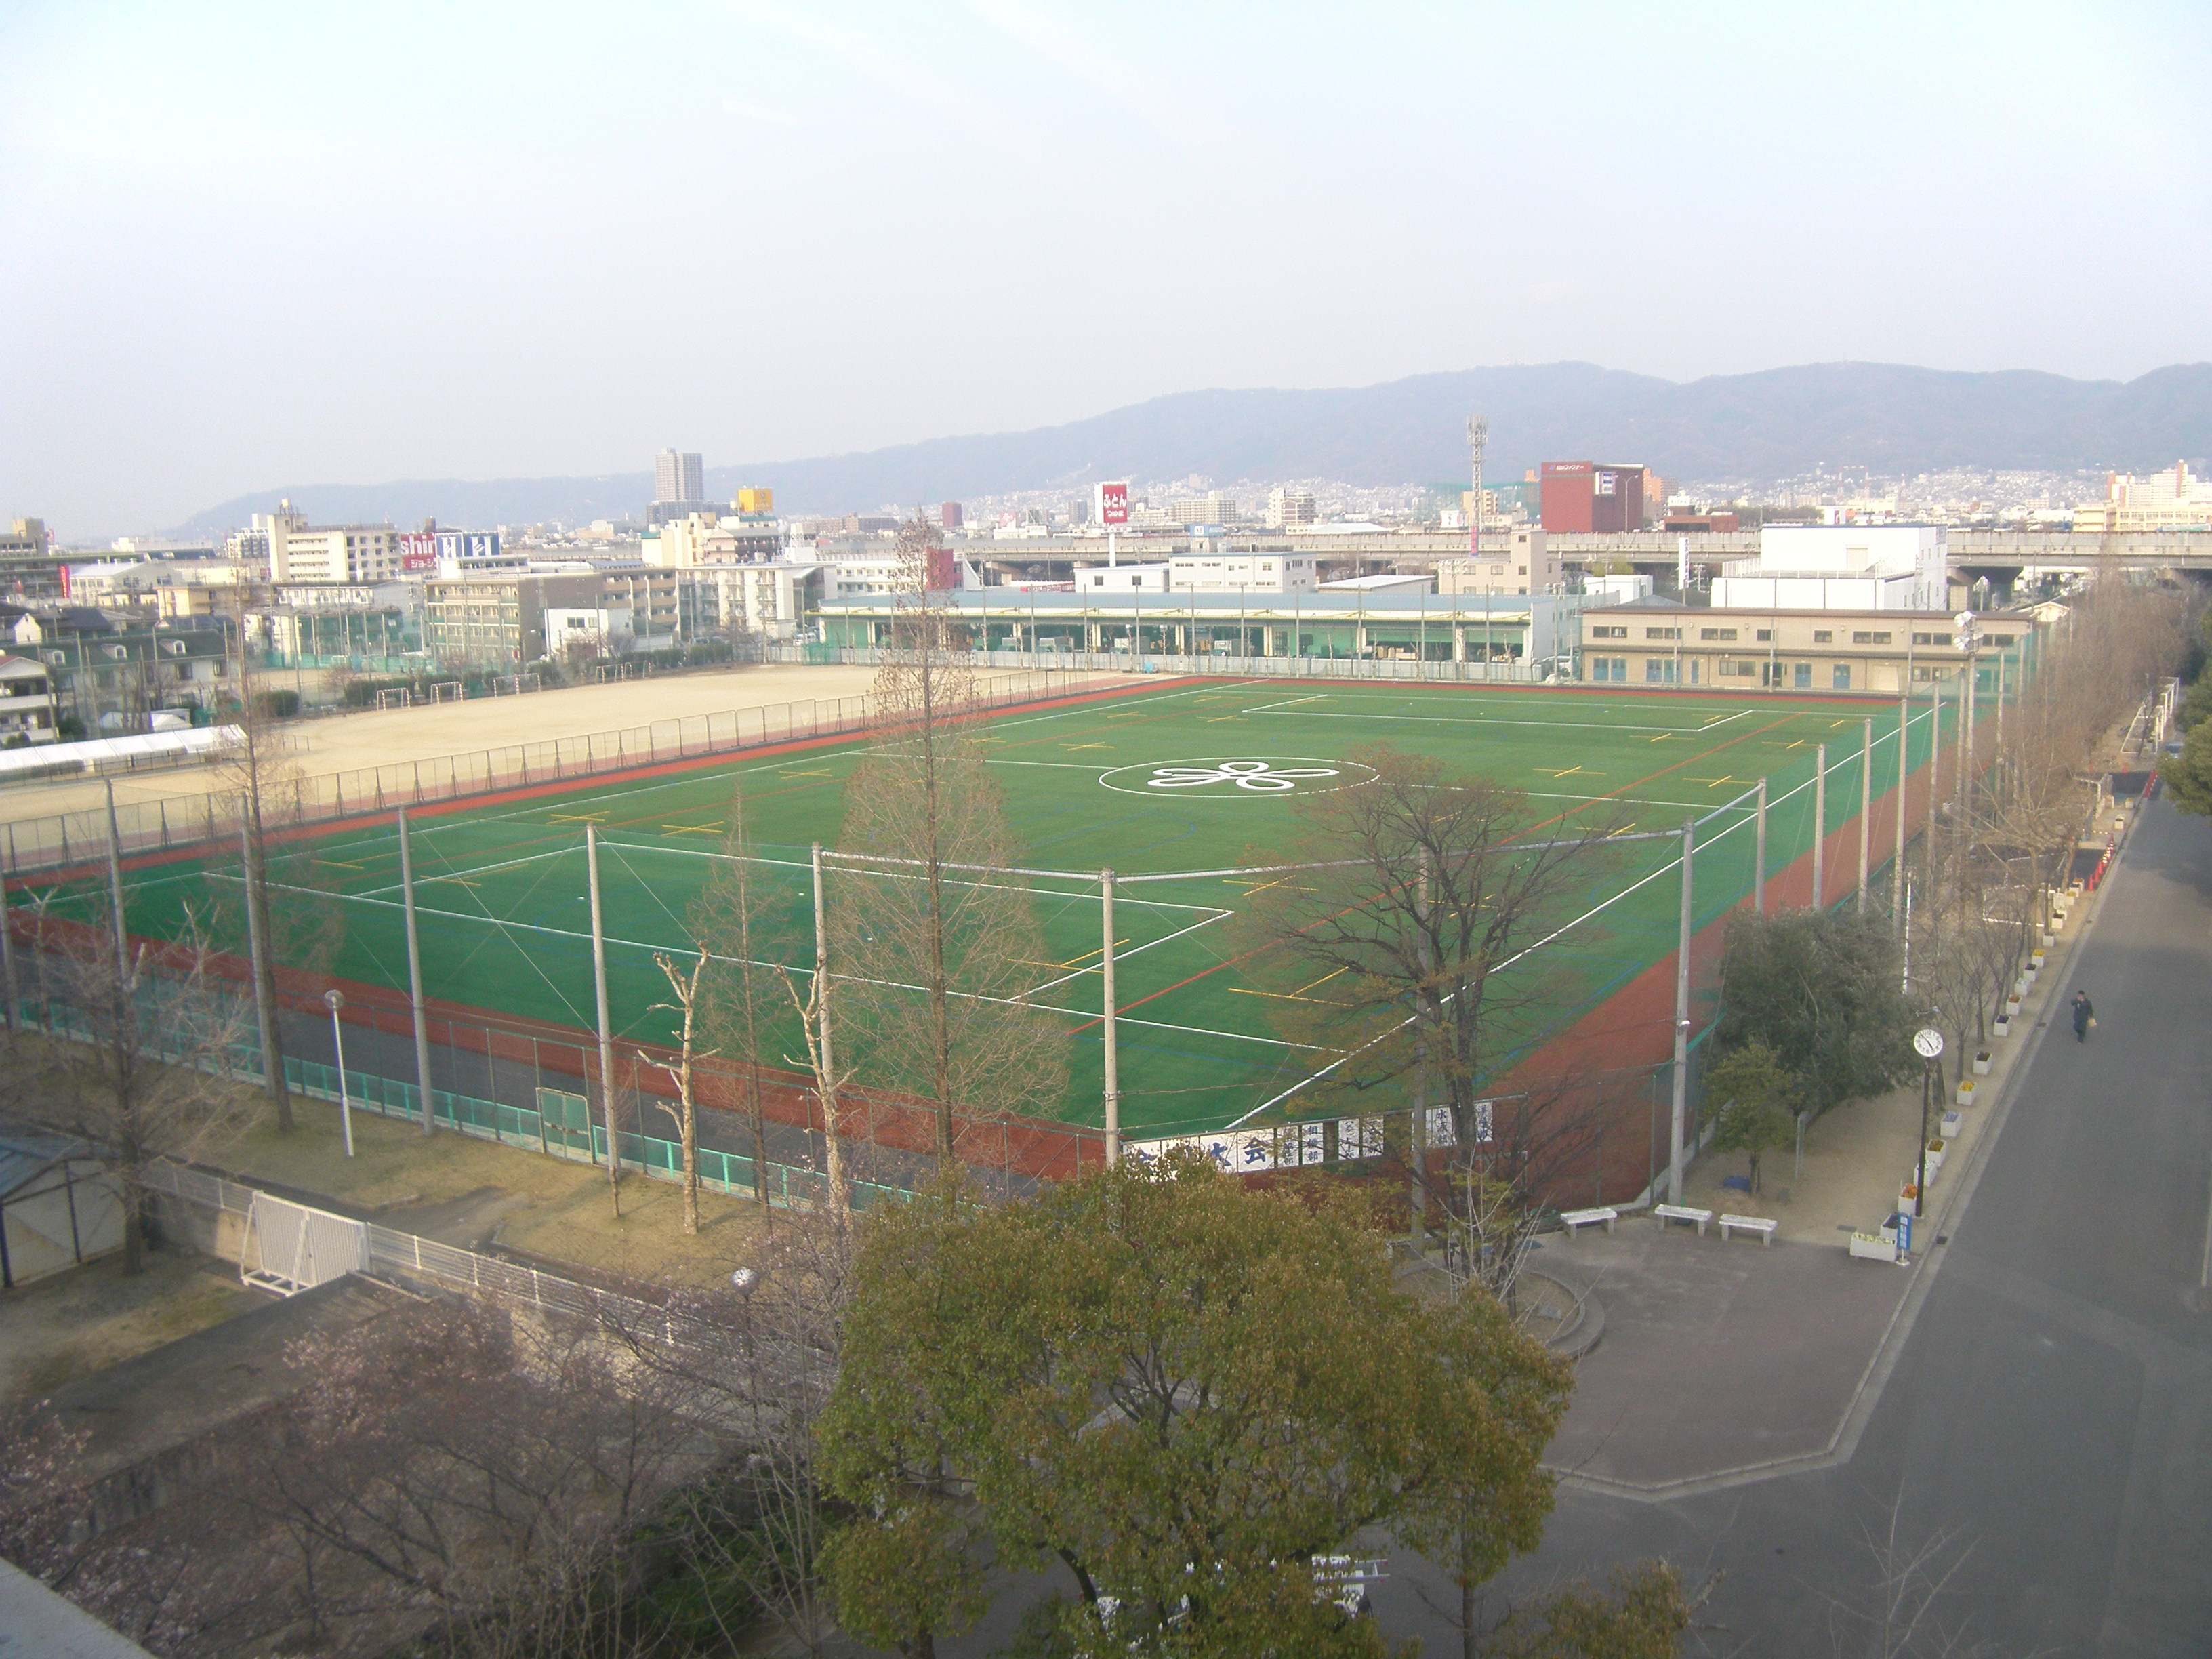 近畿大学付属高等学校・中学校グラウンド